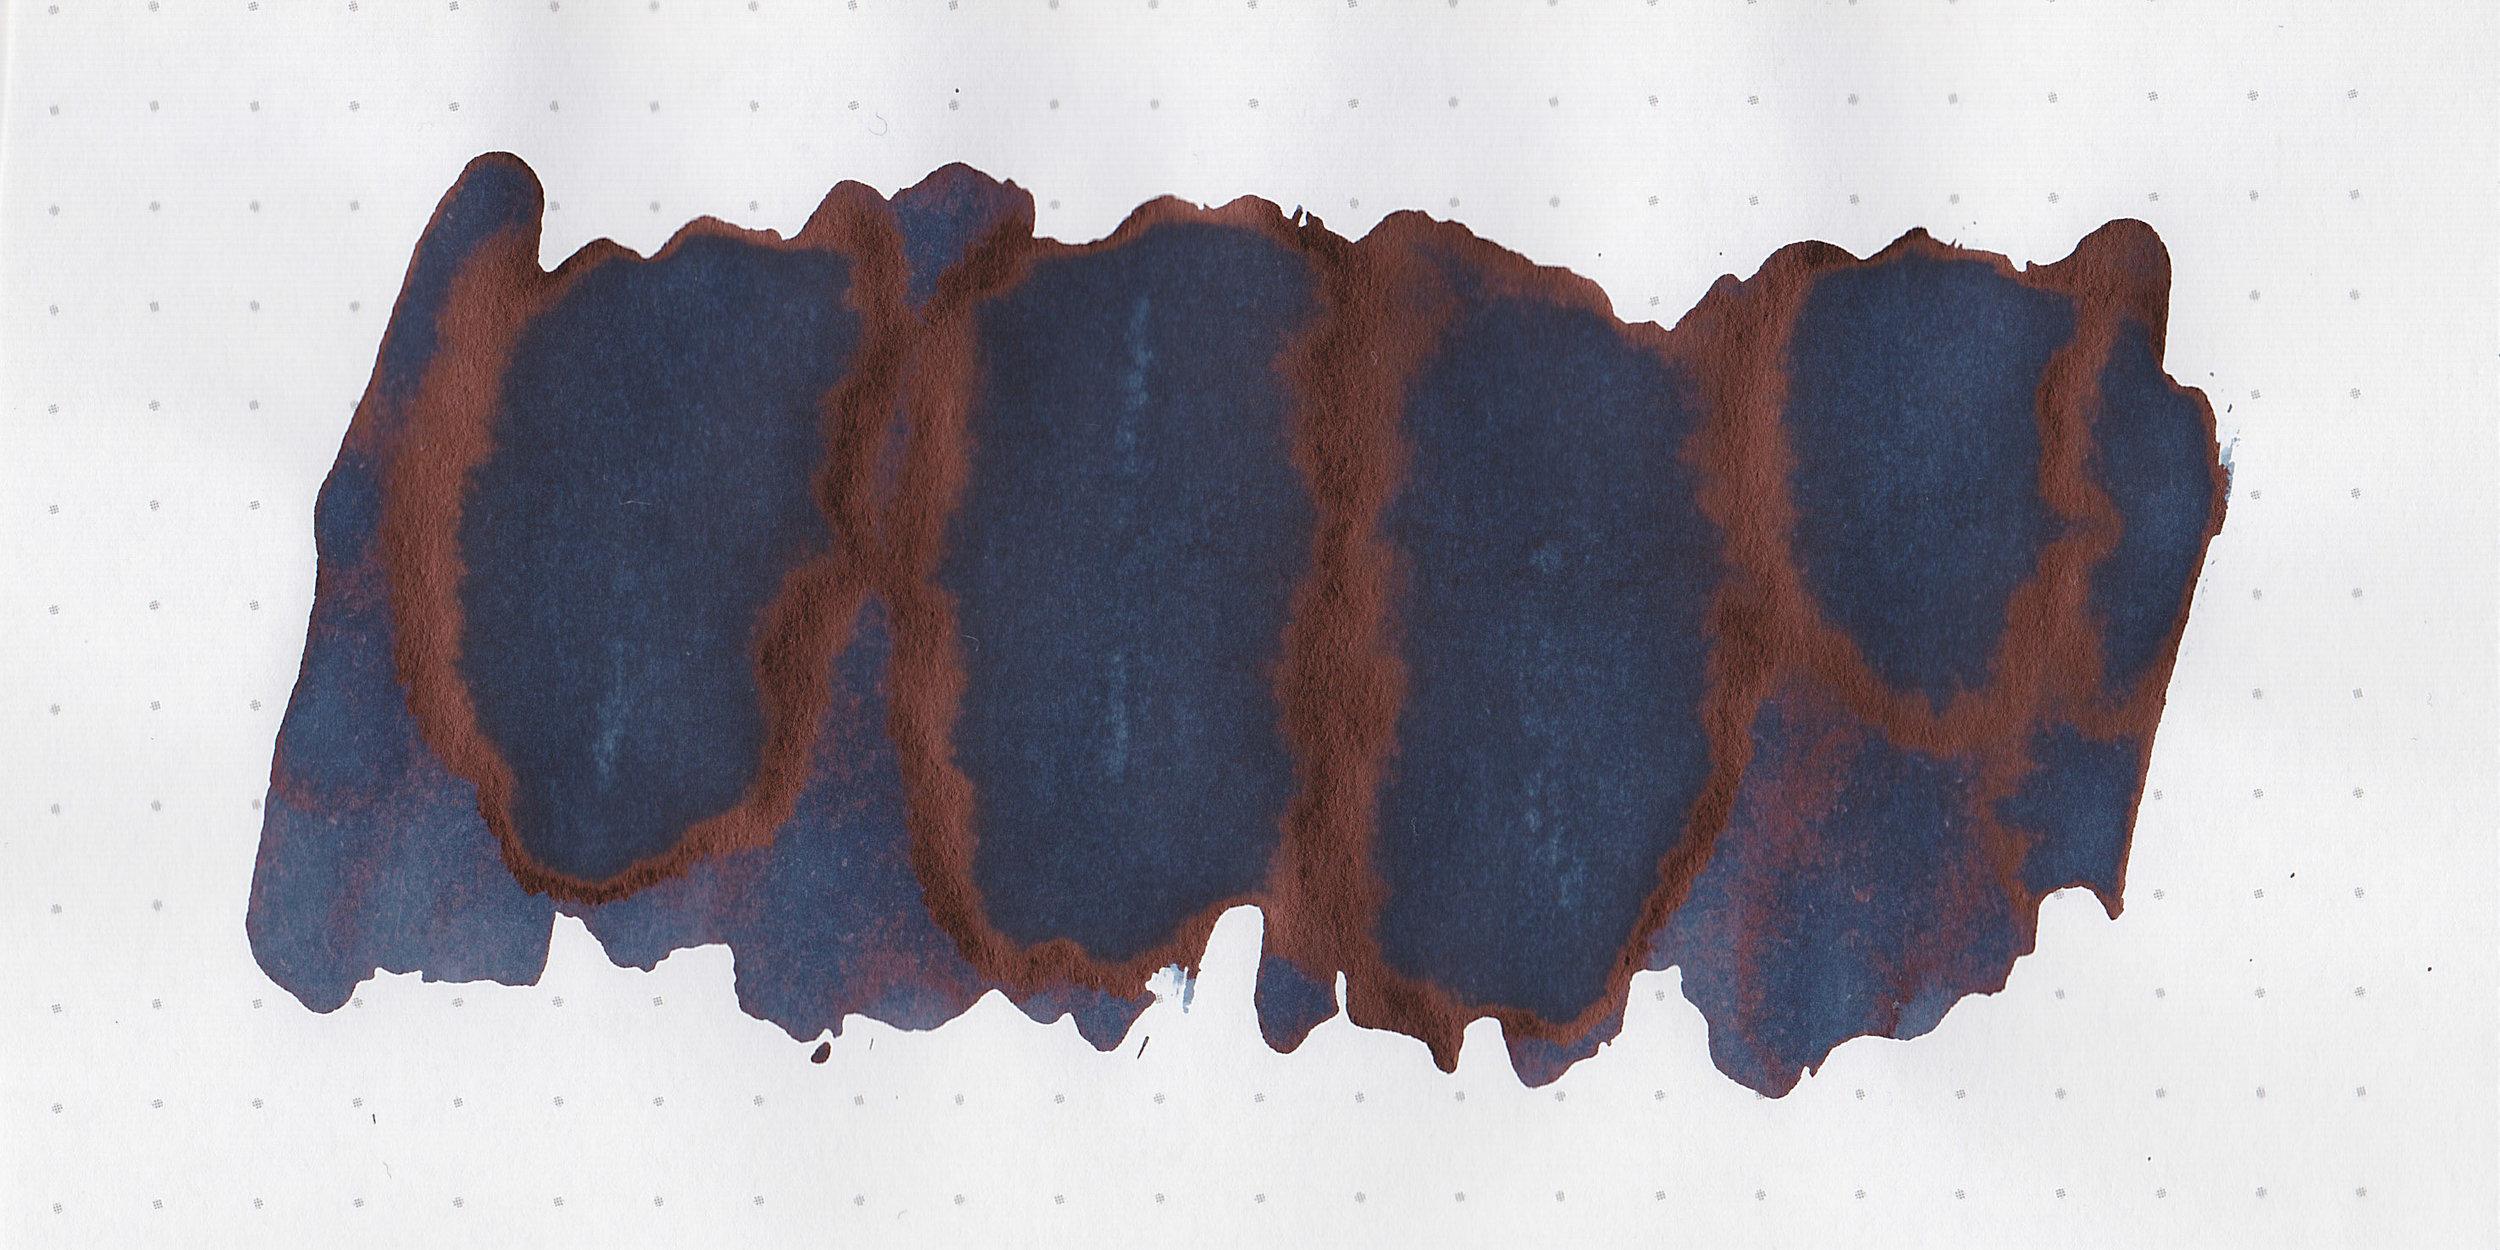 tac-aoguro-blue-black-5.jpg